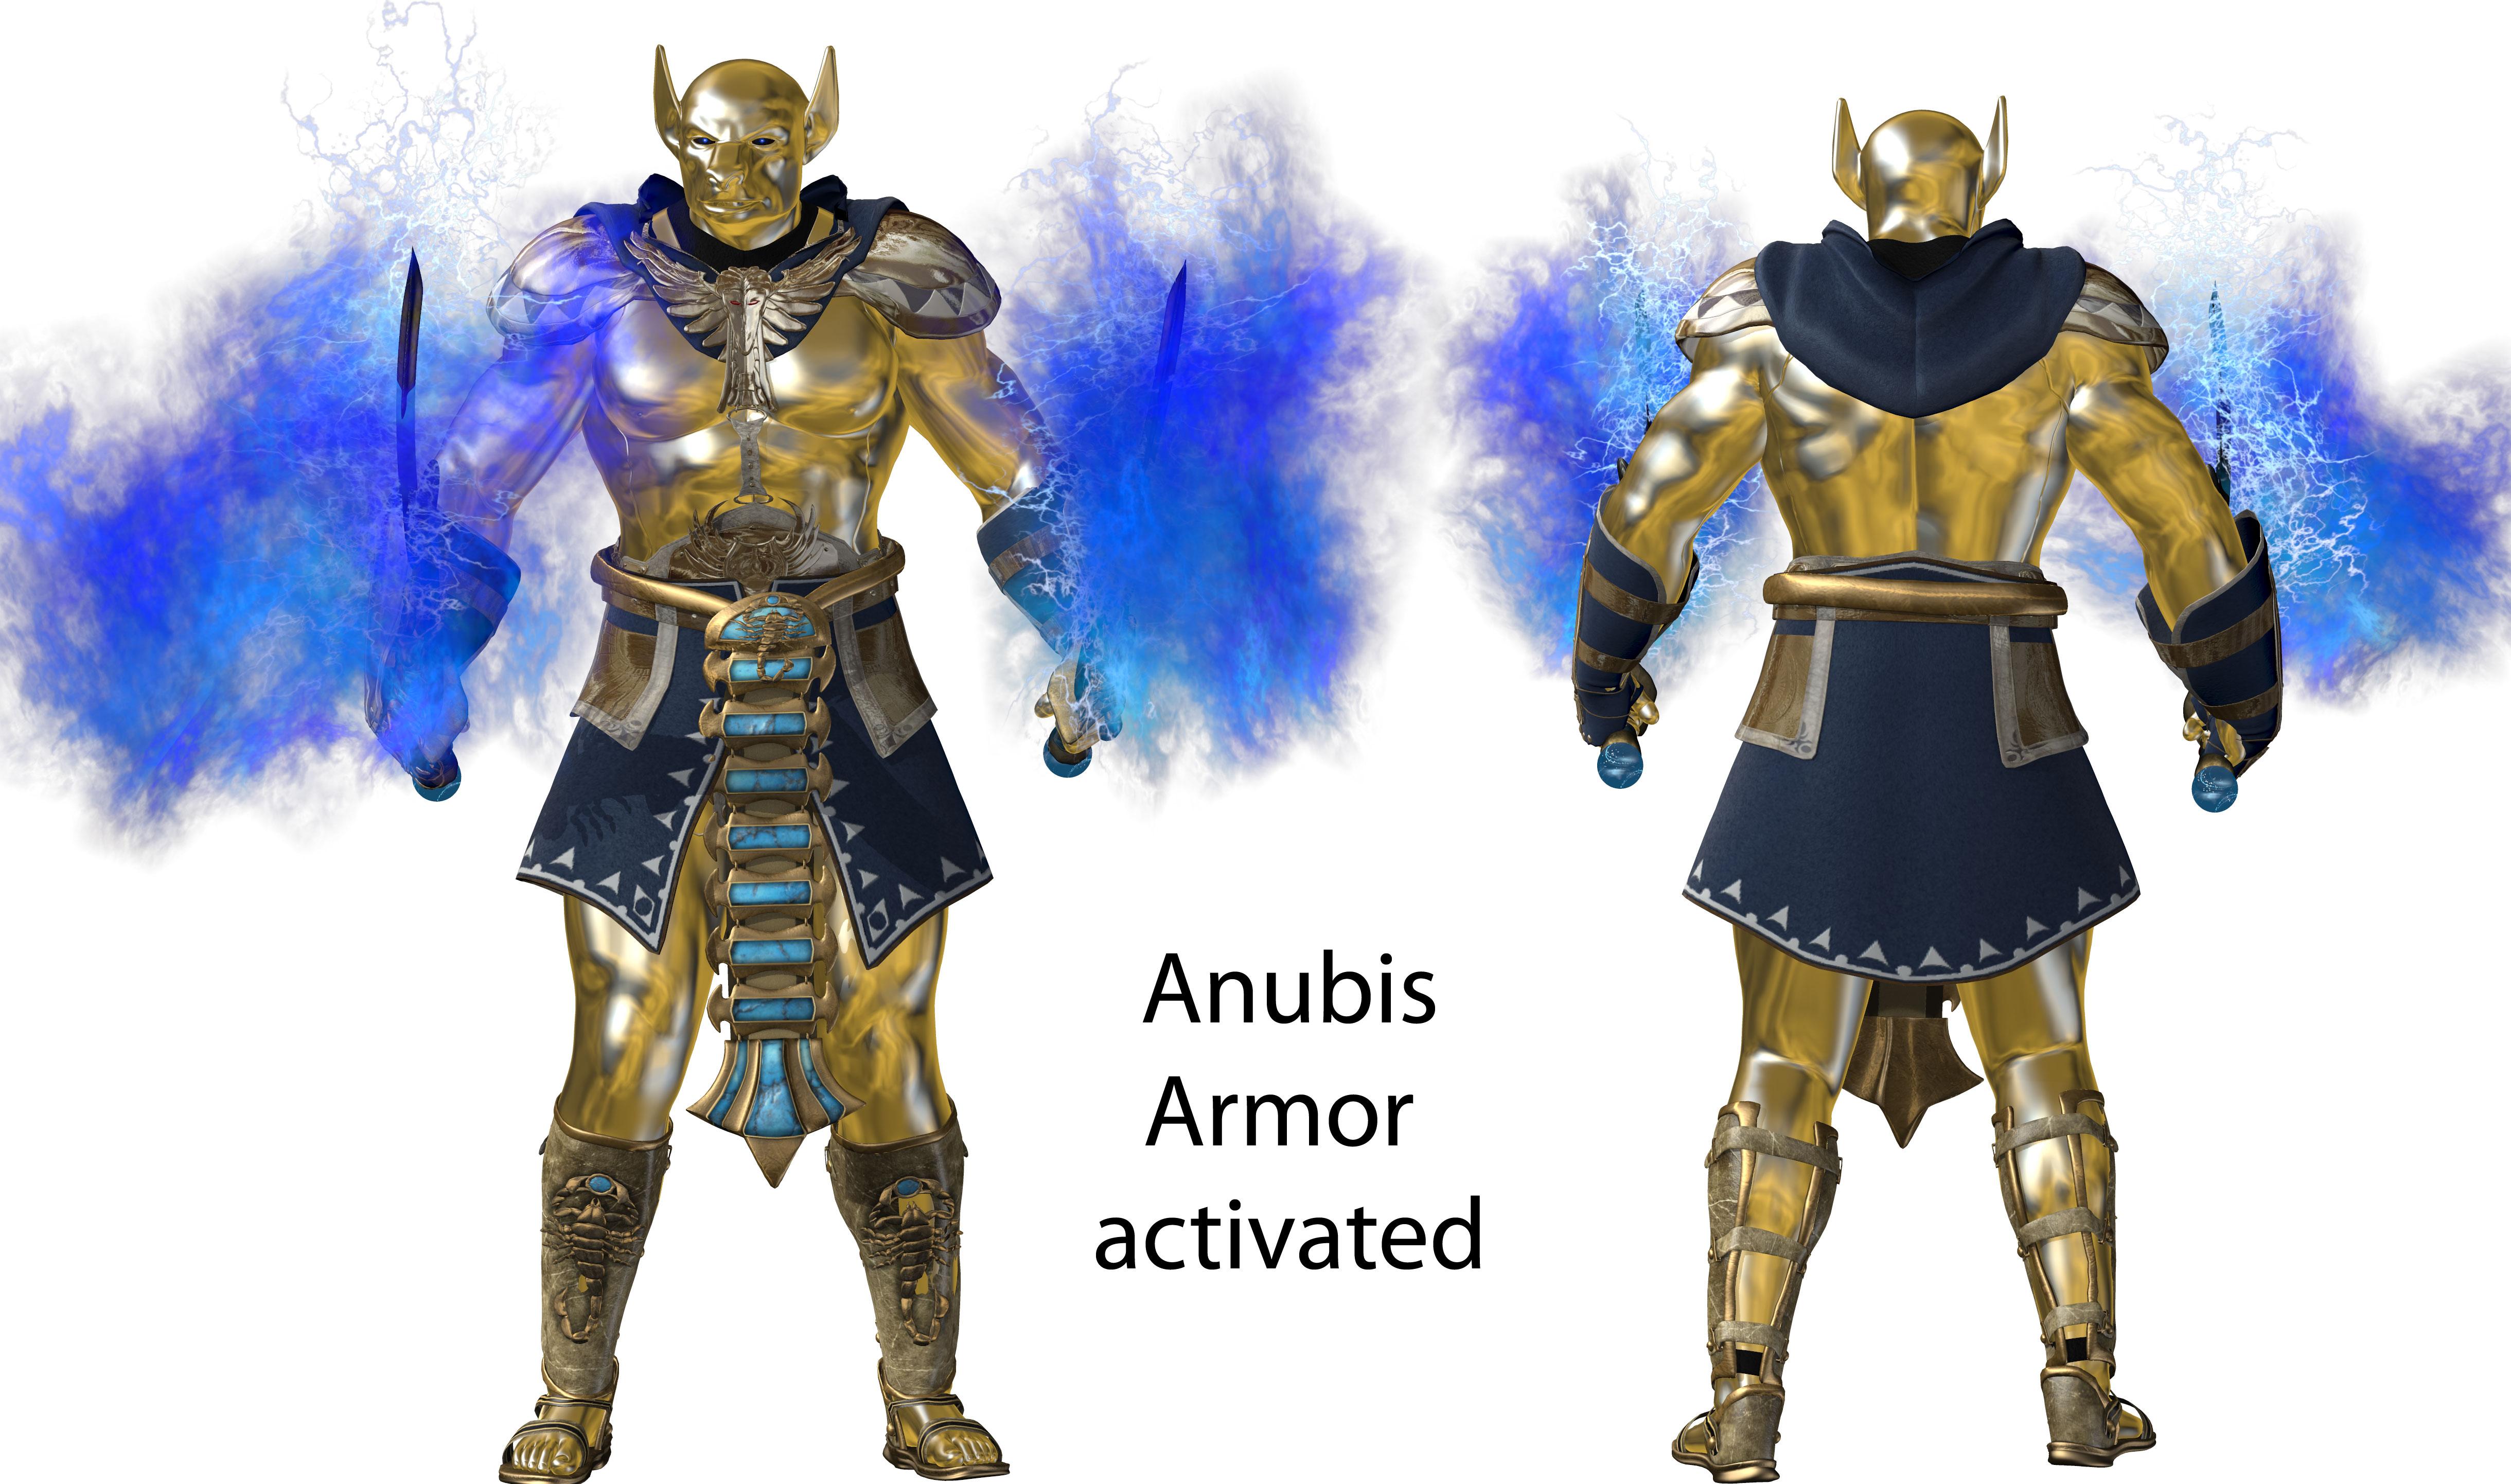 Anubis-(-Armored)